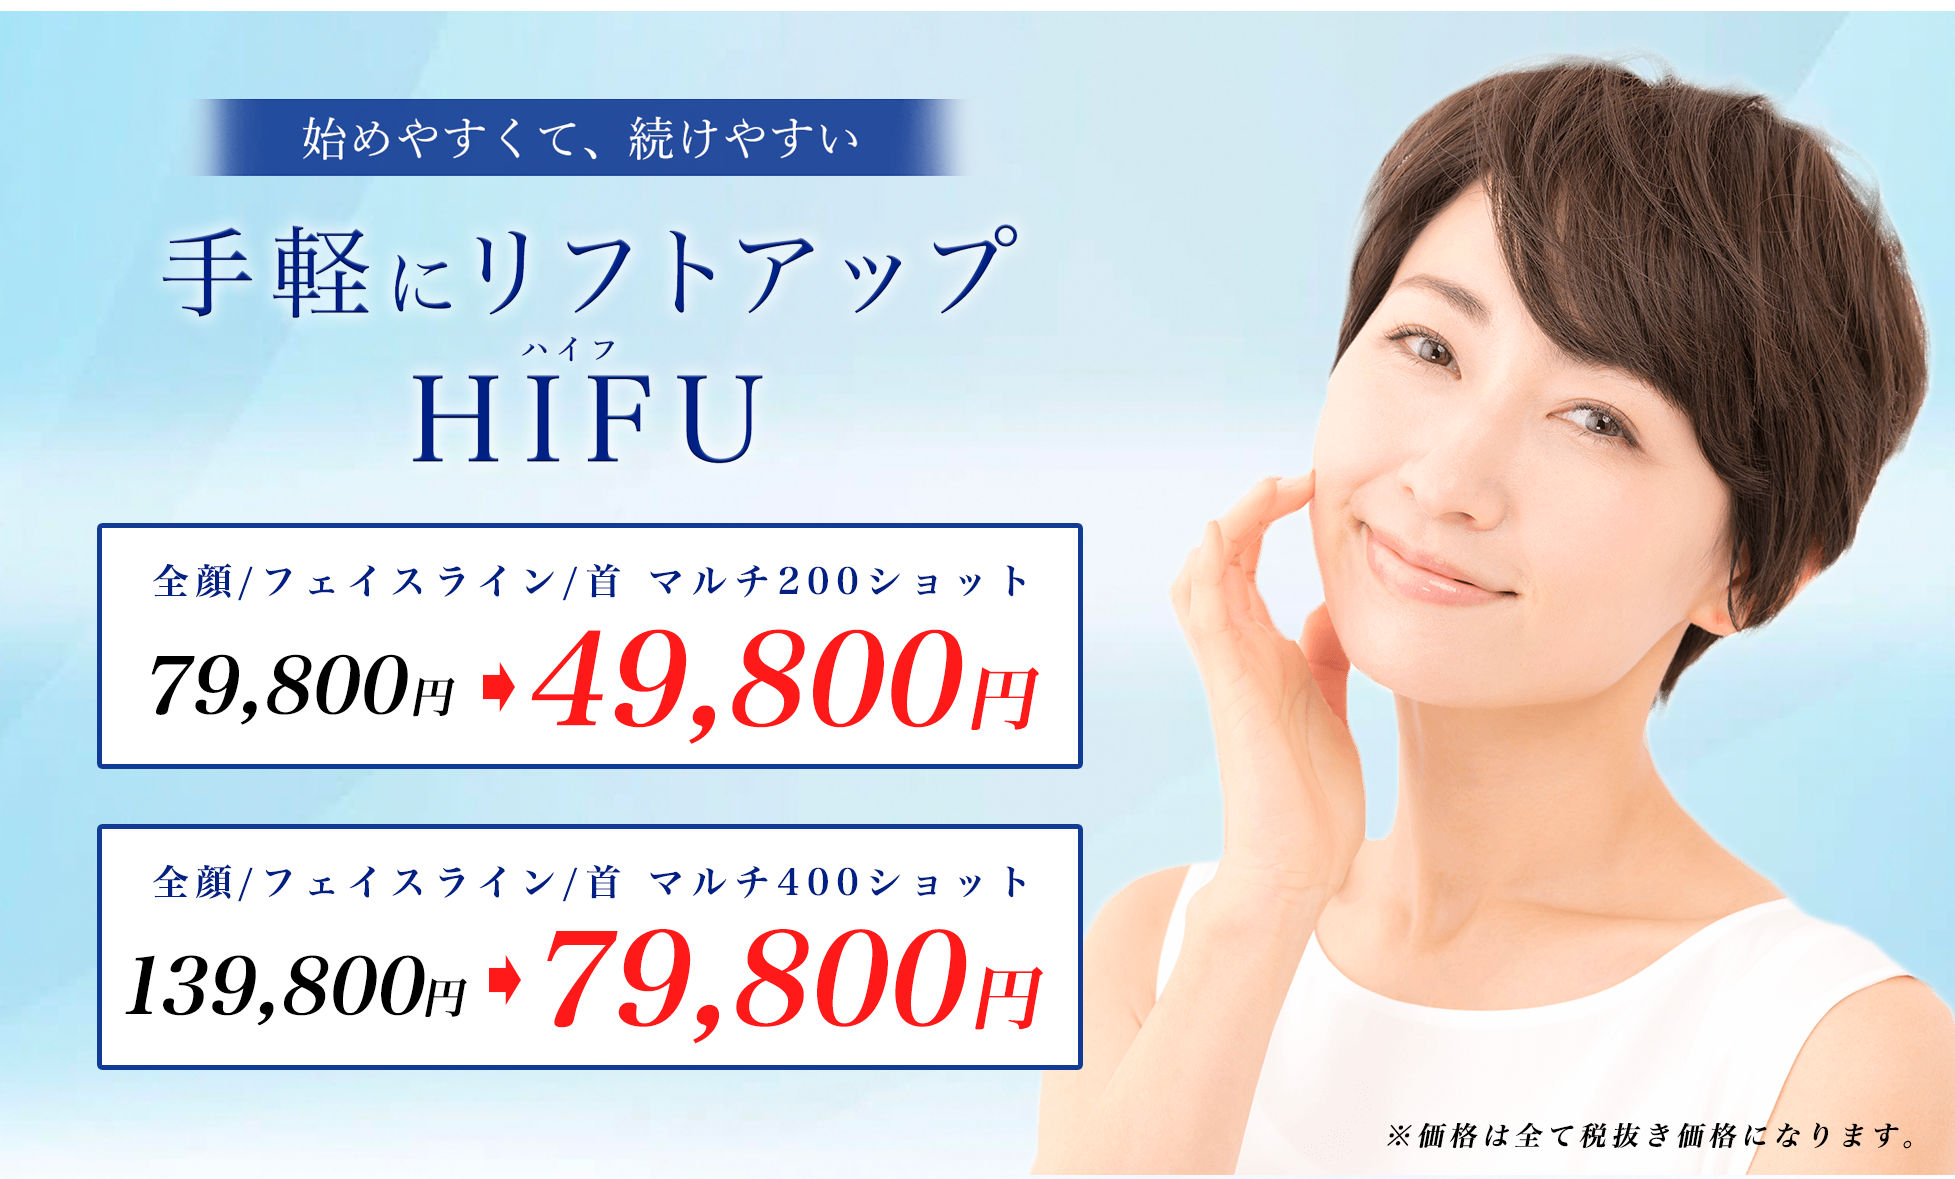 HIFU 200shot 39,800円 400shot 79,800円